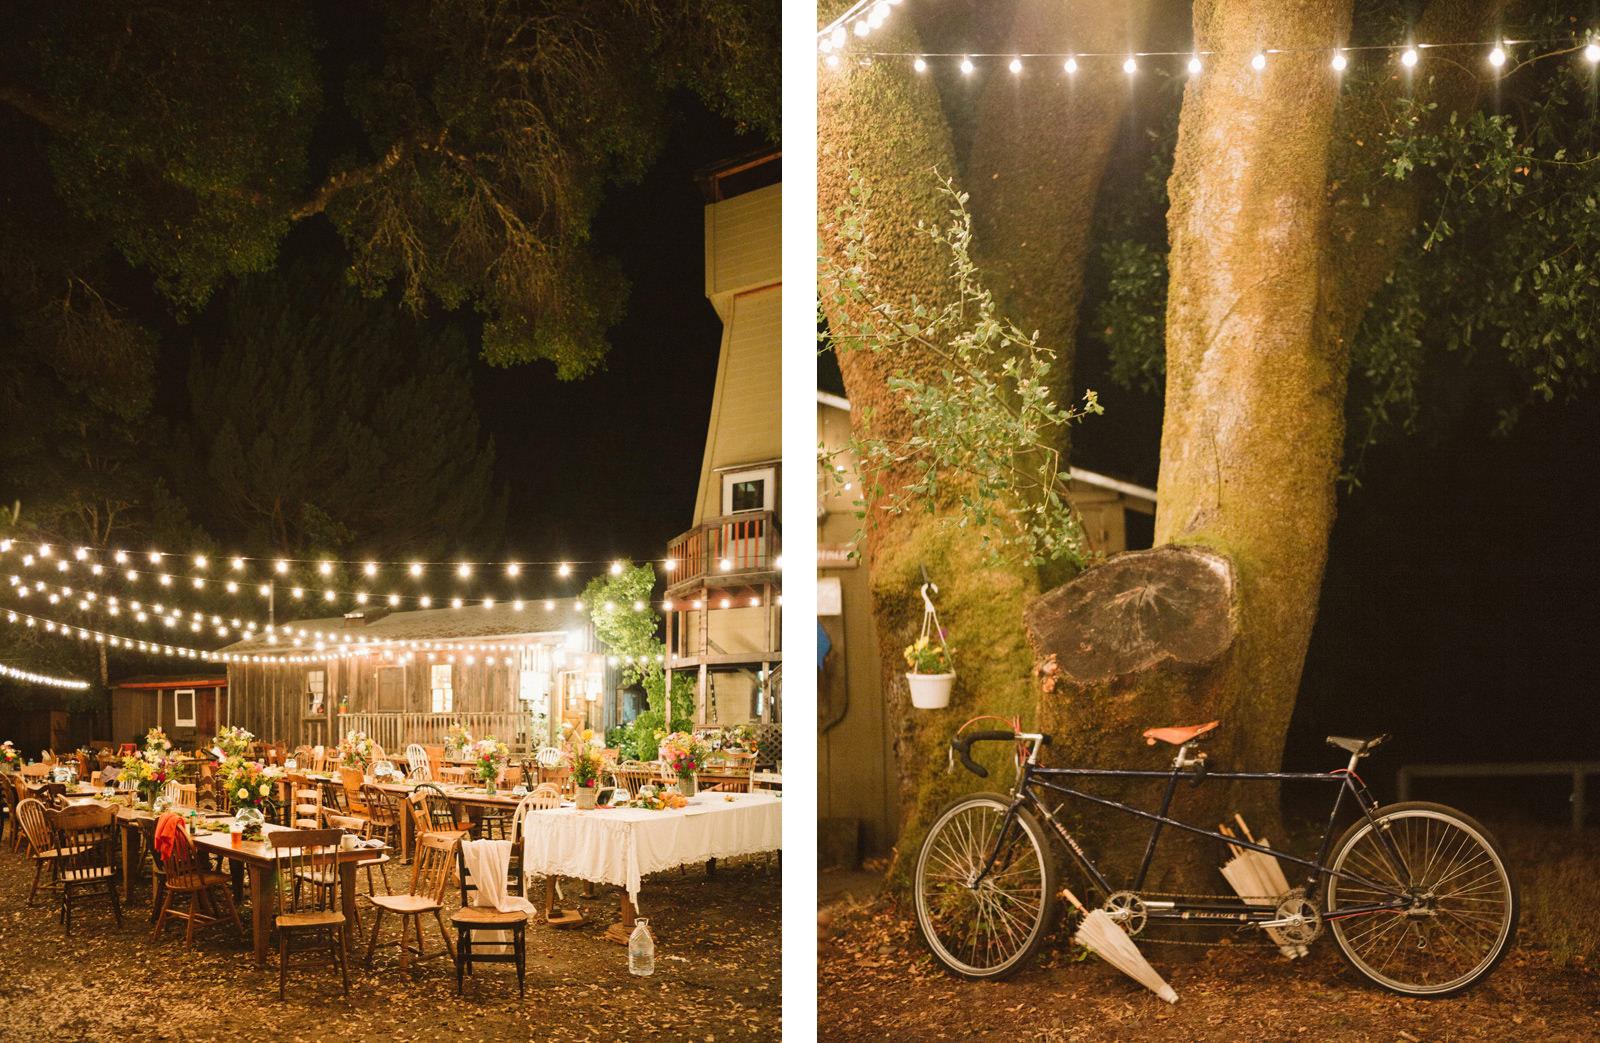 rivers-bend-retreat-wedding-123 RIVER'S BEND RETREAT WEDDING